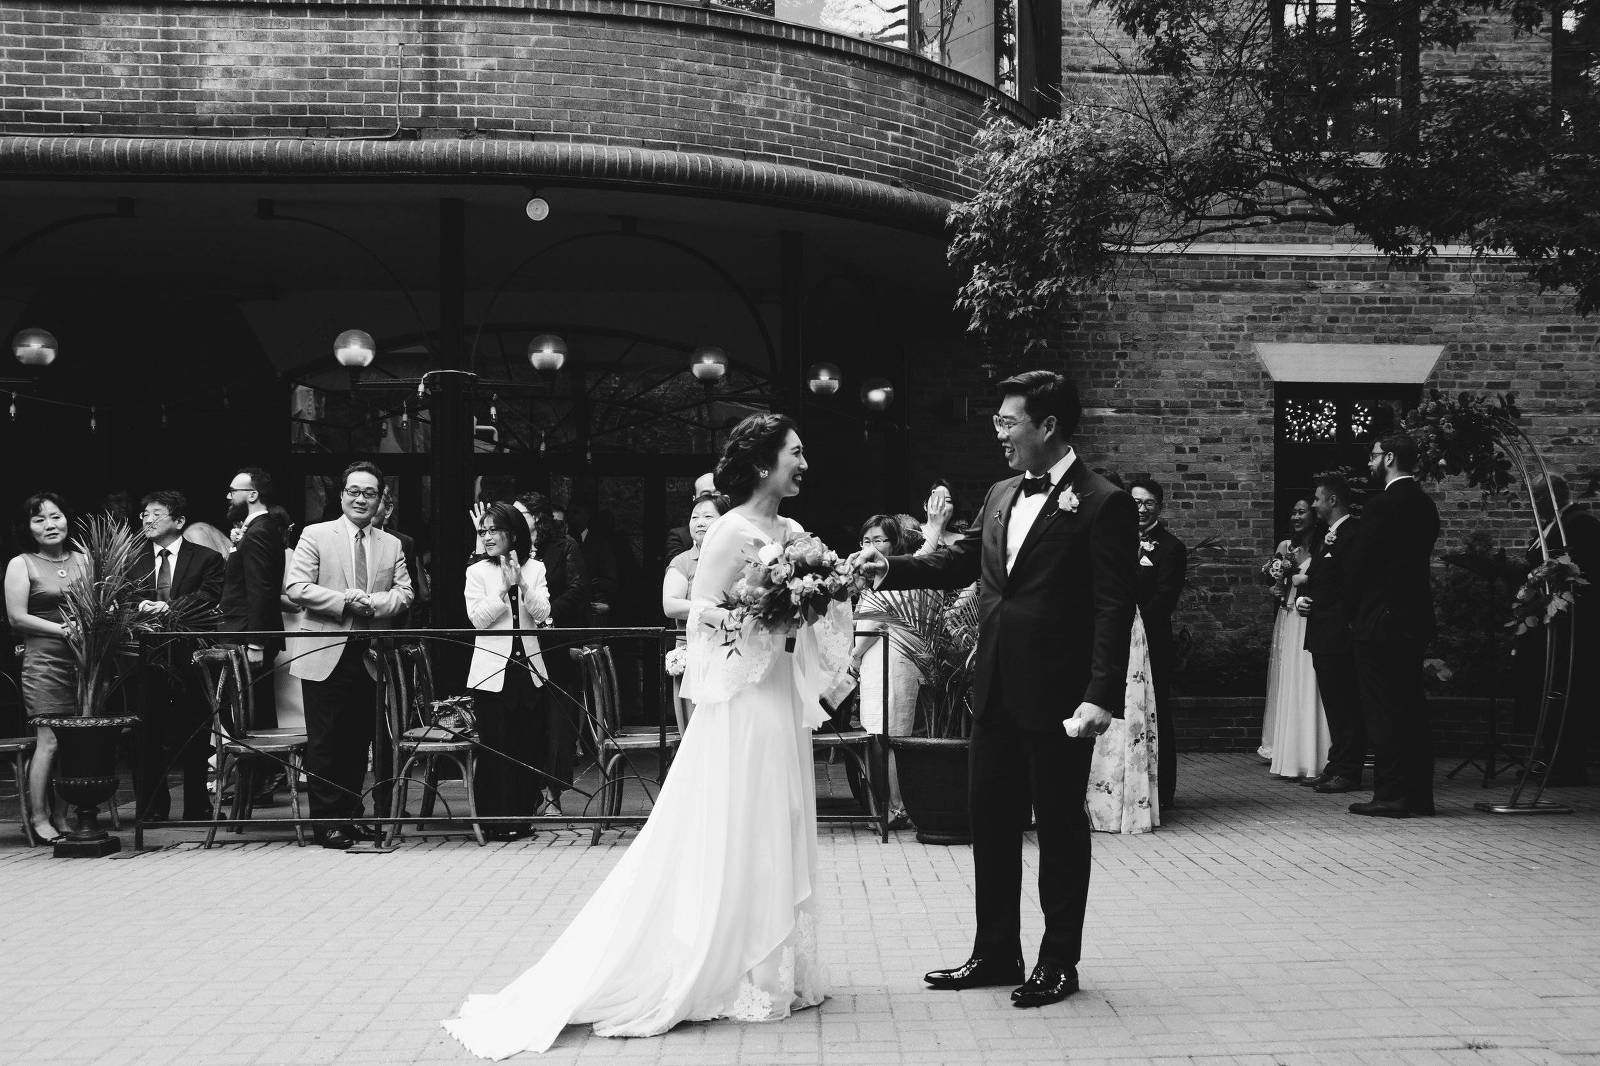 Bride and groom at toronto sculpture garden